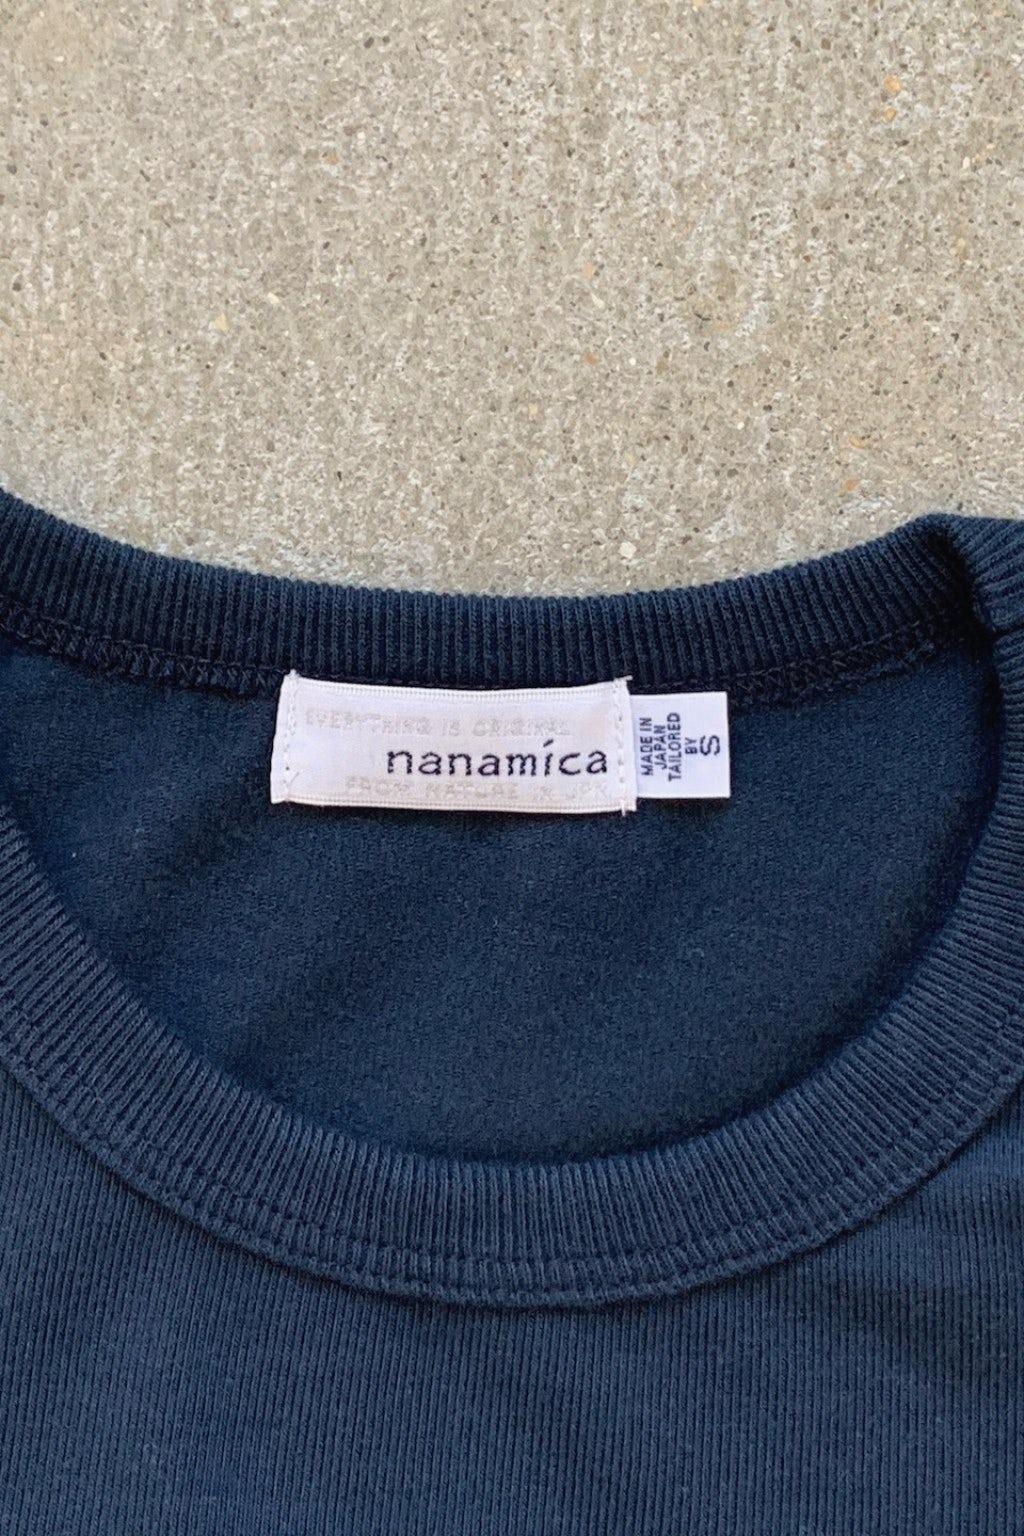 Nanamica Coolmax Jersey Tee Navy